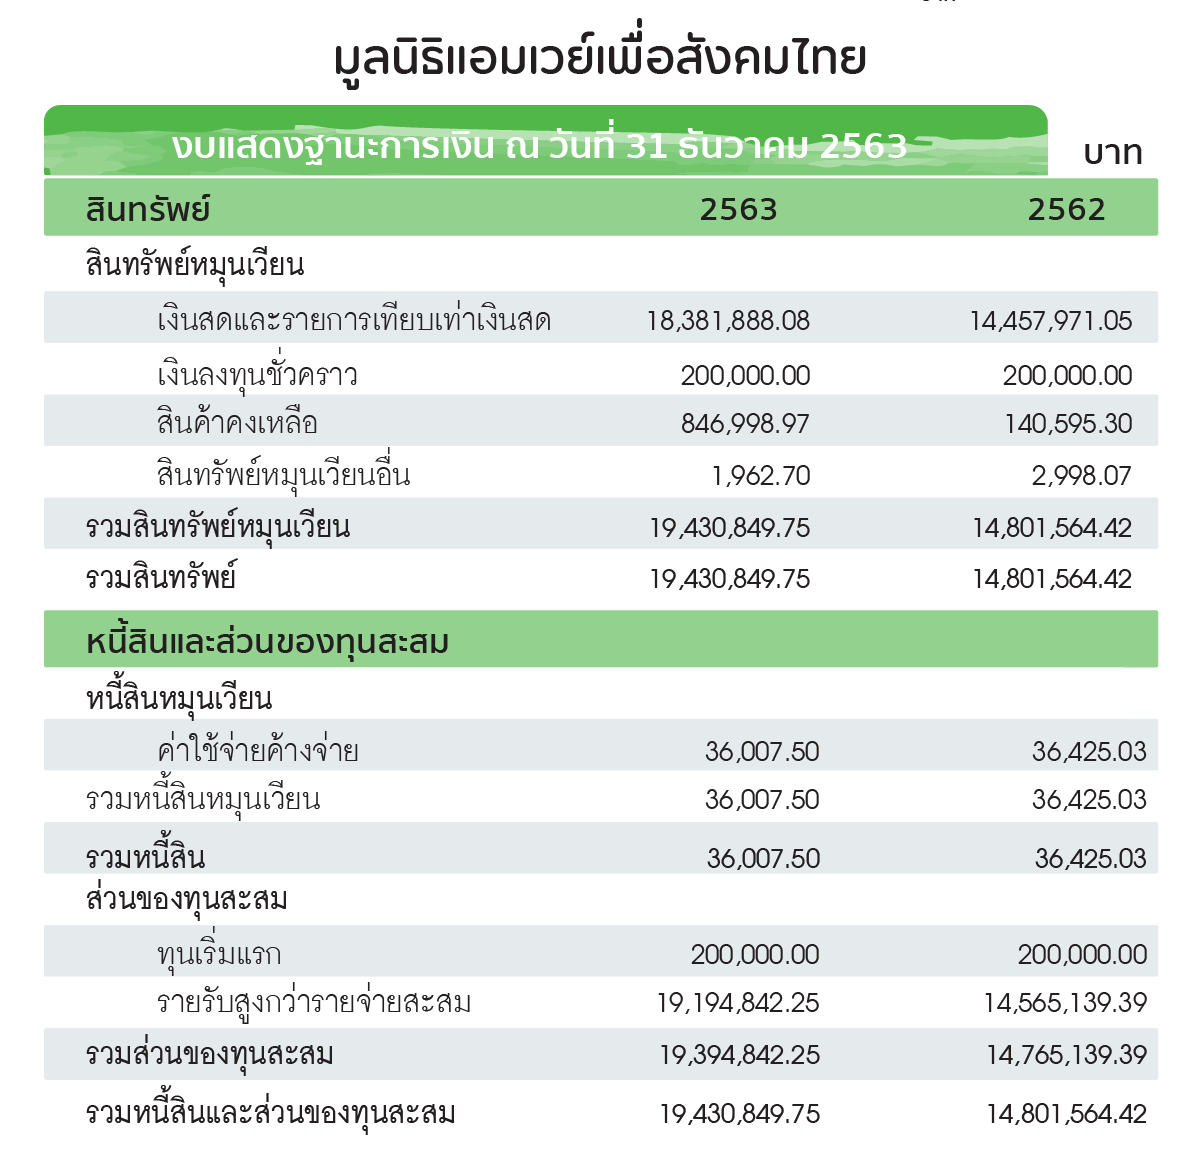 csr_jul21_table1.png